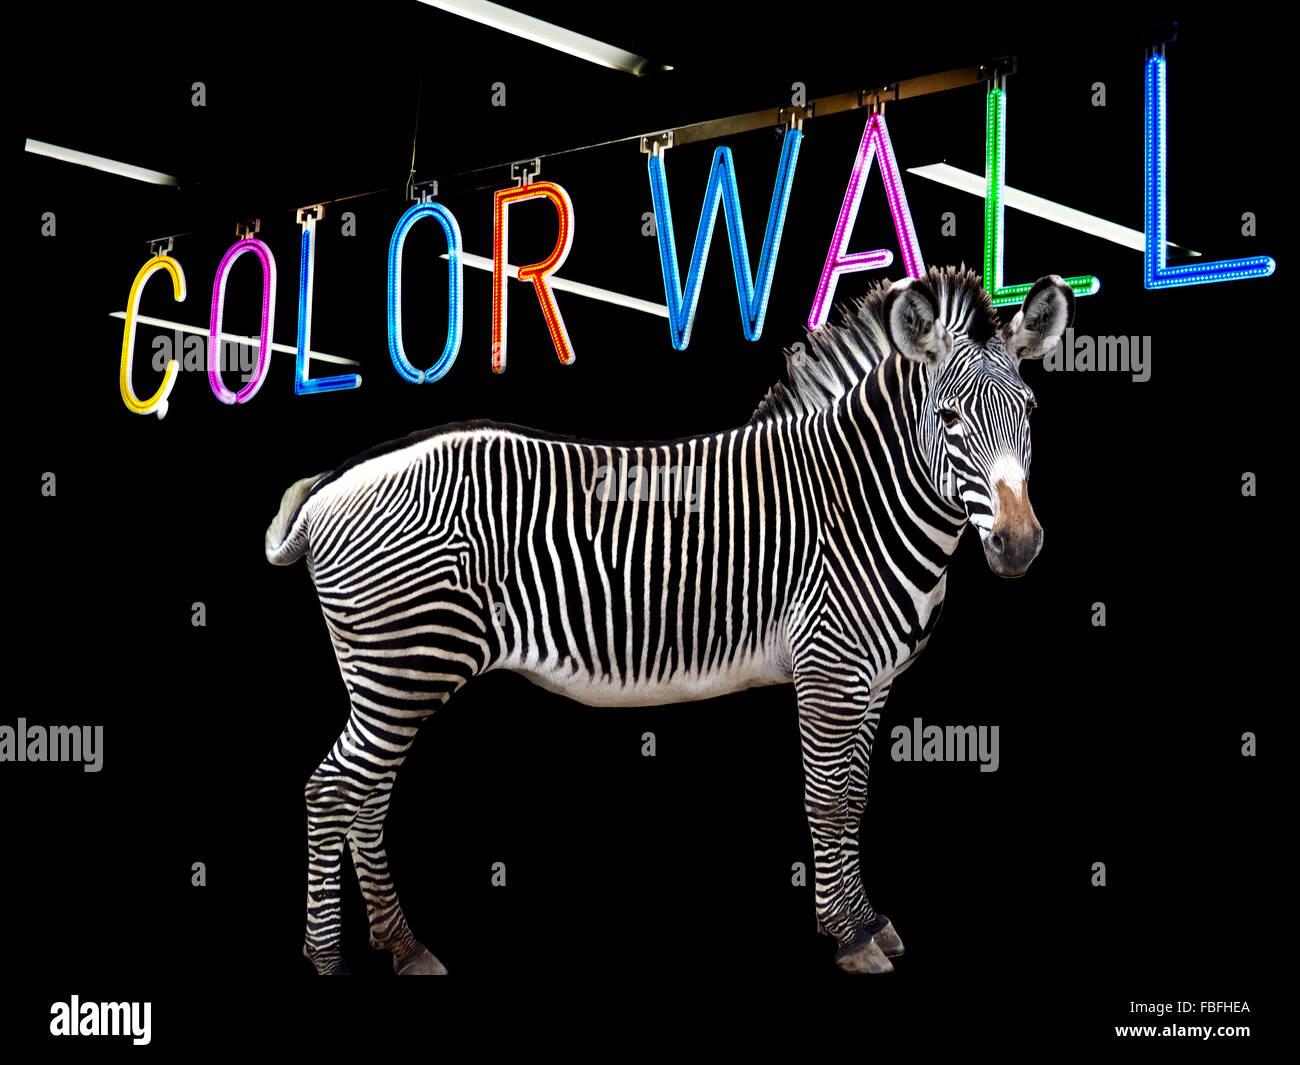 Digital Composite Image Of Zebra Against Colorful Text Against Black Background - Stock Image